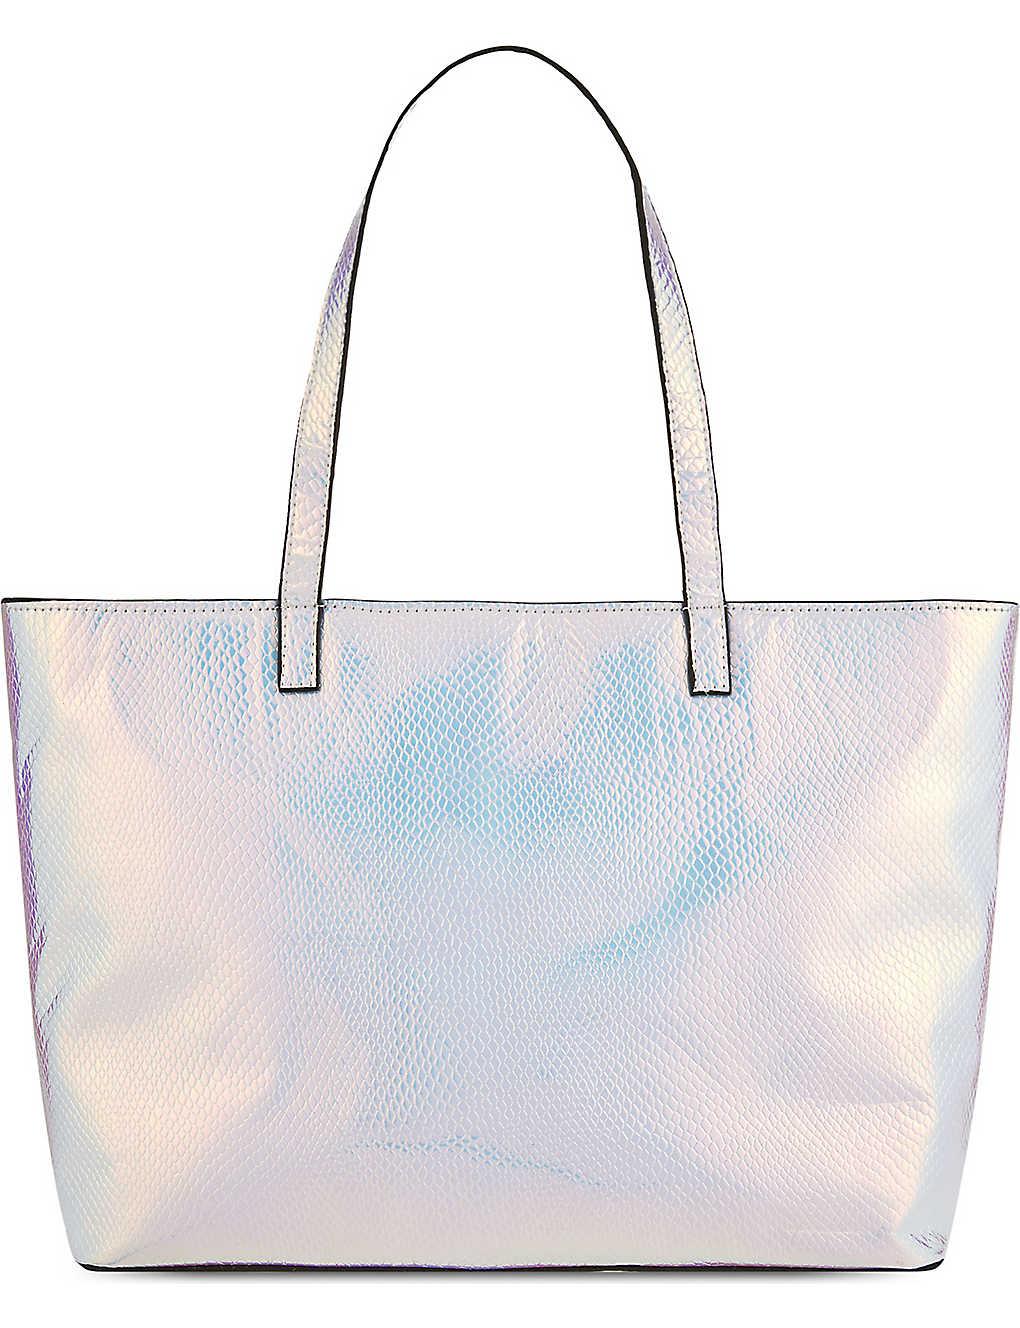 b5a2290b7 SKINNYDIP - Cosmo silver bag   Selfridges.com